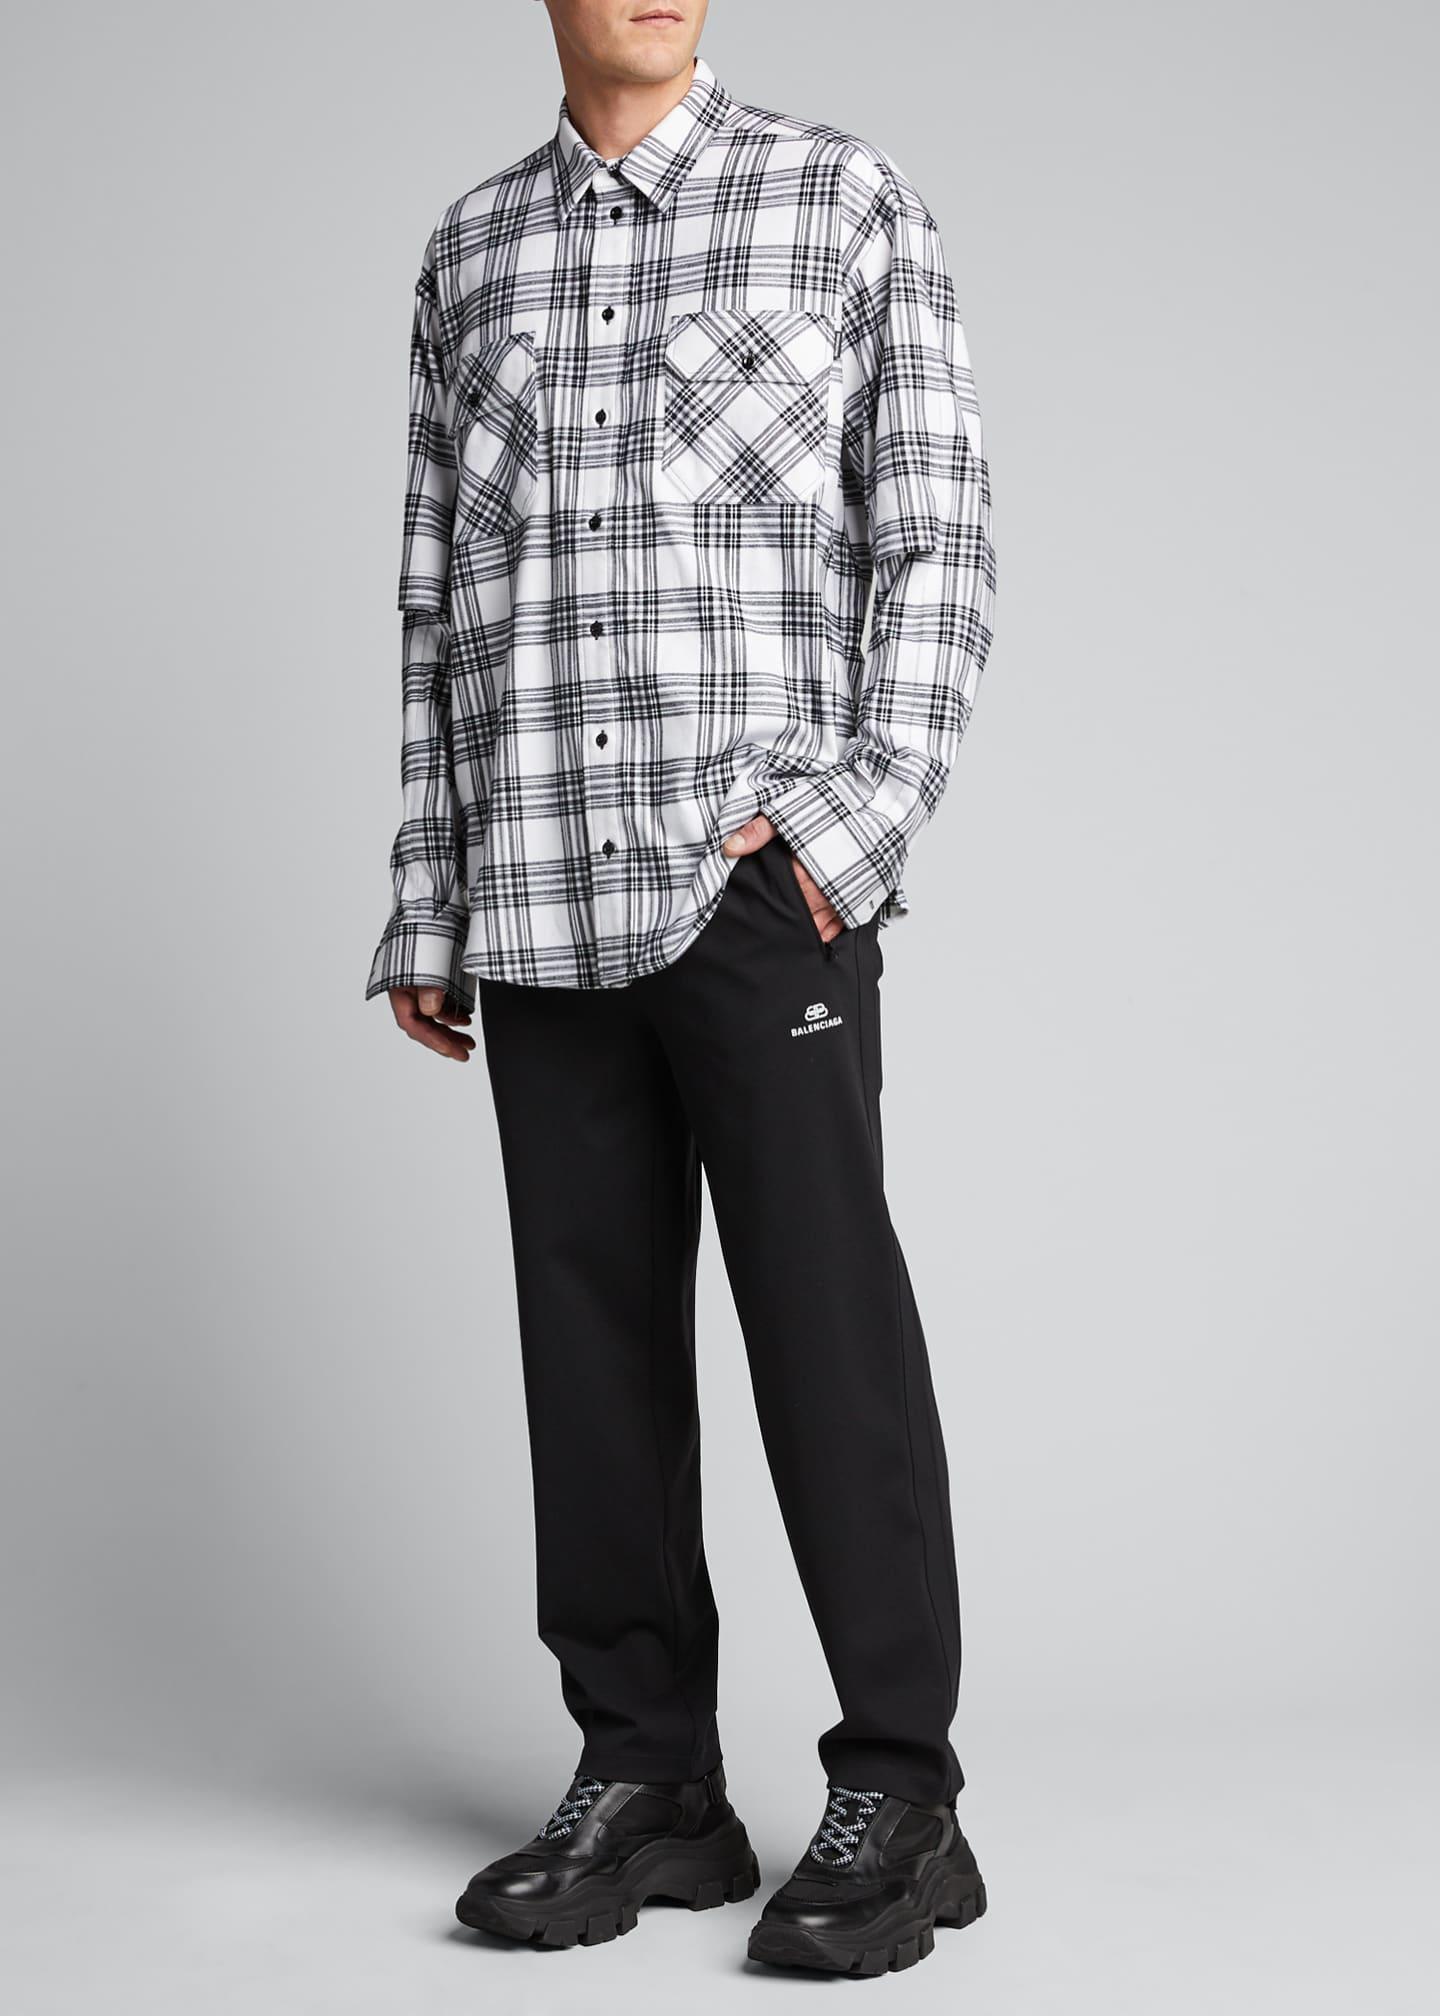 Balenciaga Men's Flannel Check Split-Sleeve Sport Shirt